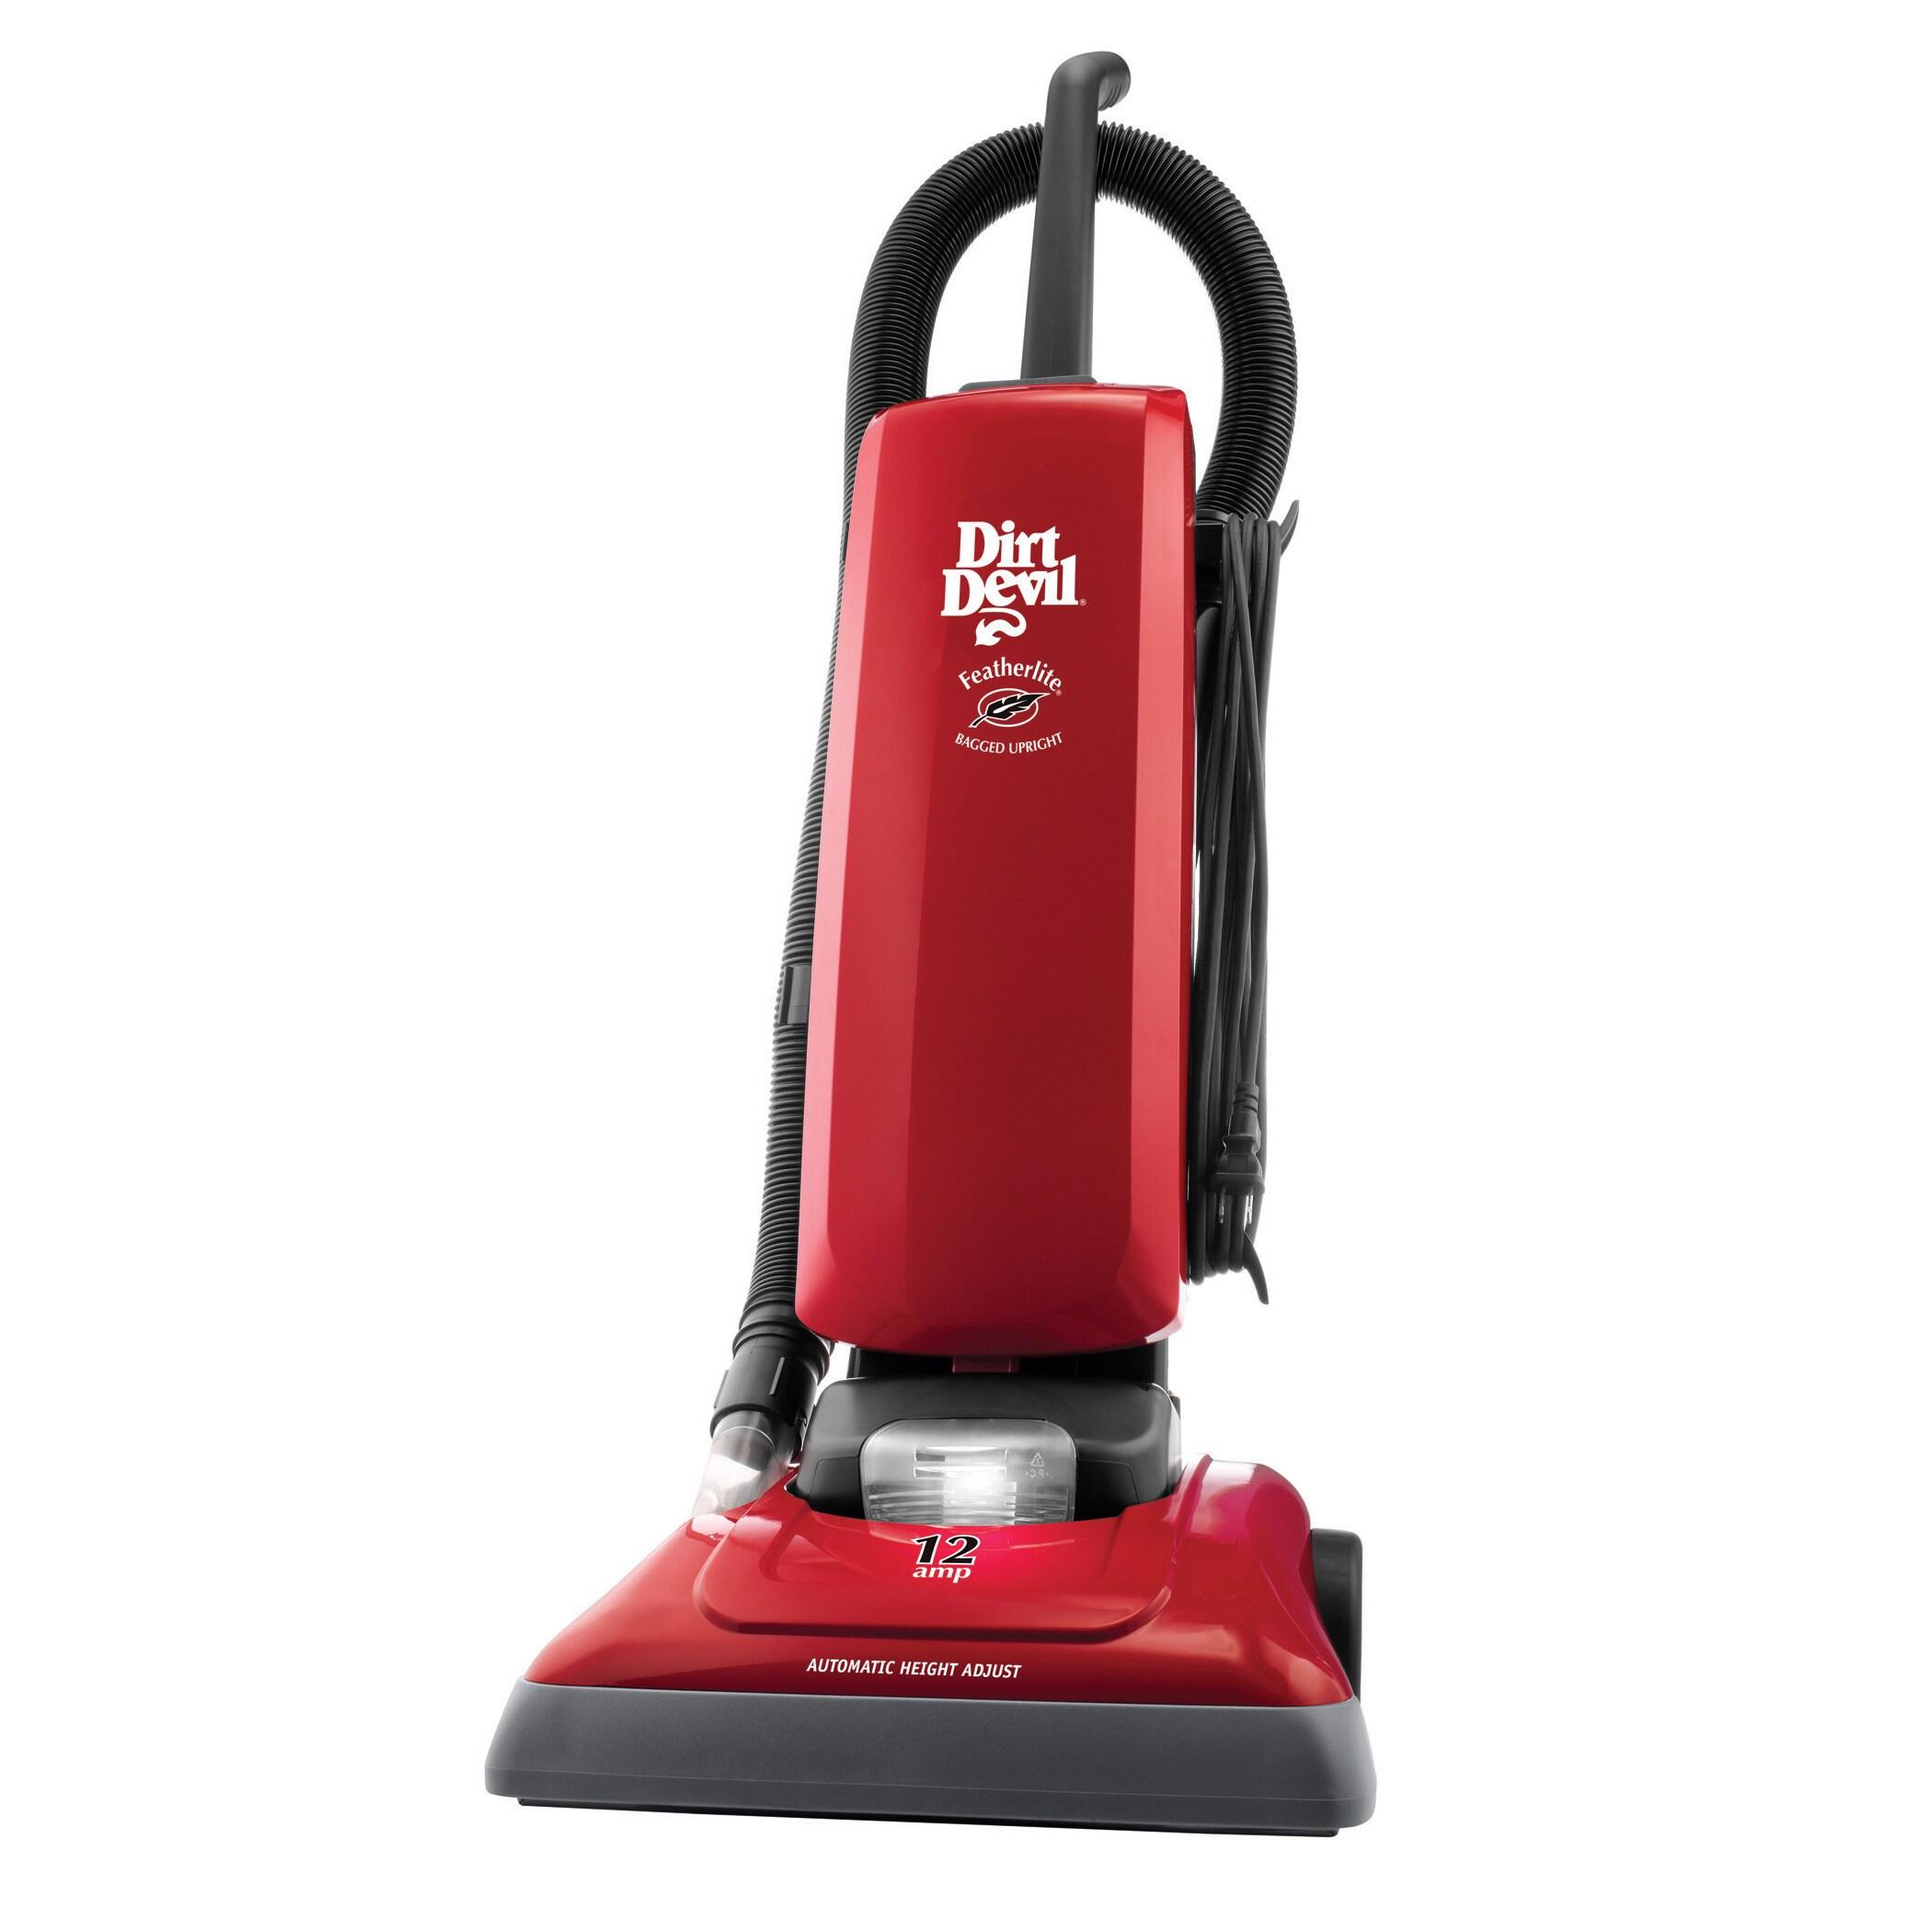 Dirt Devil Toy Vacuum Cleaner Voyeur Rooms